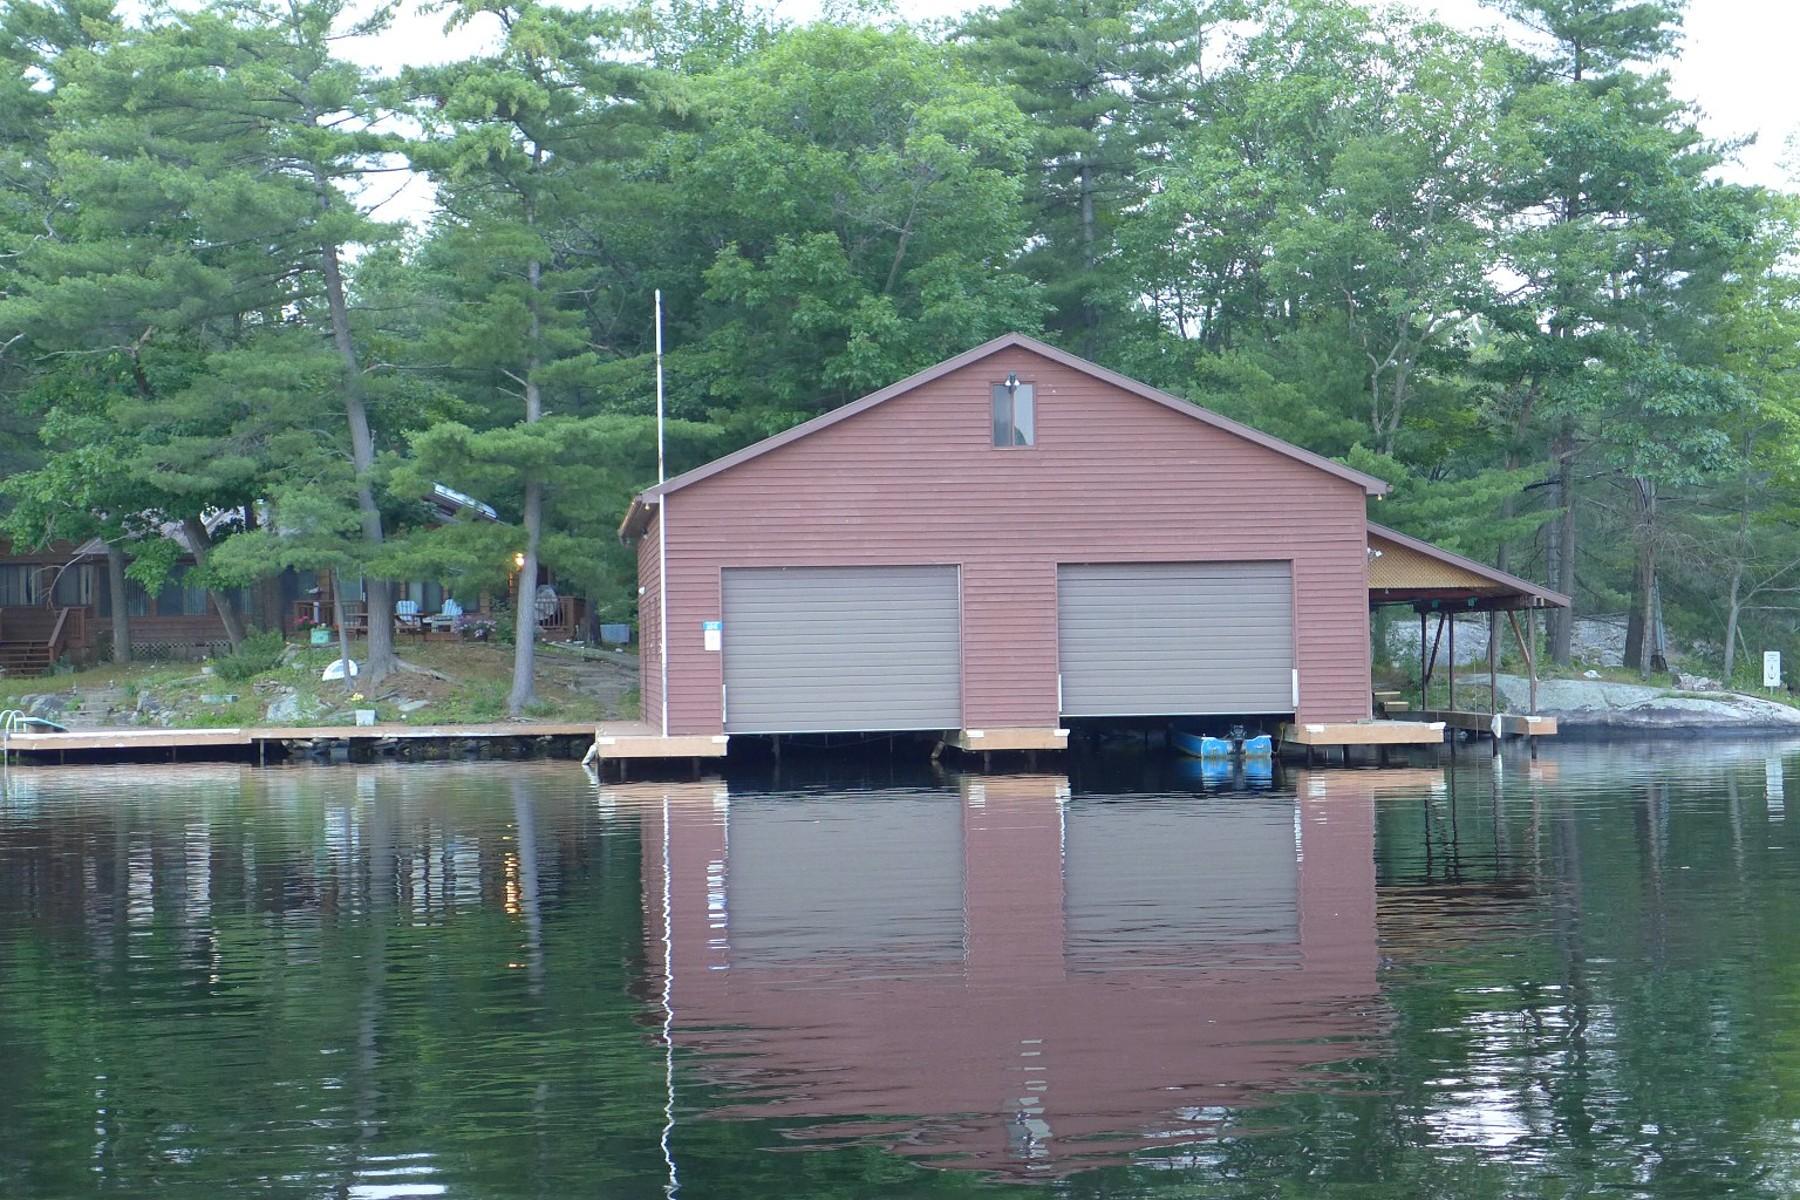 Casa Unifamiliar por un Venta en Water Access Cottage & Landing 6041 Severn River Shore Georgian Bay, Ontario L0K1E0 Canadá